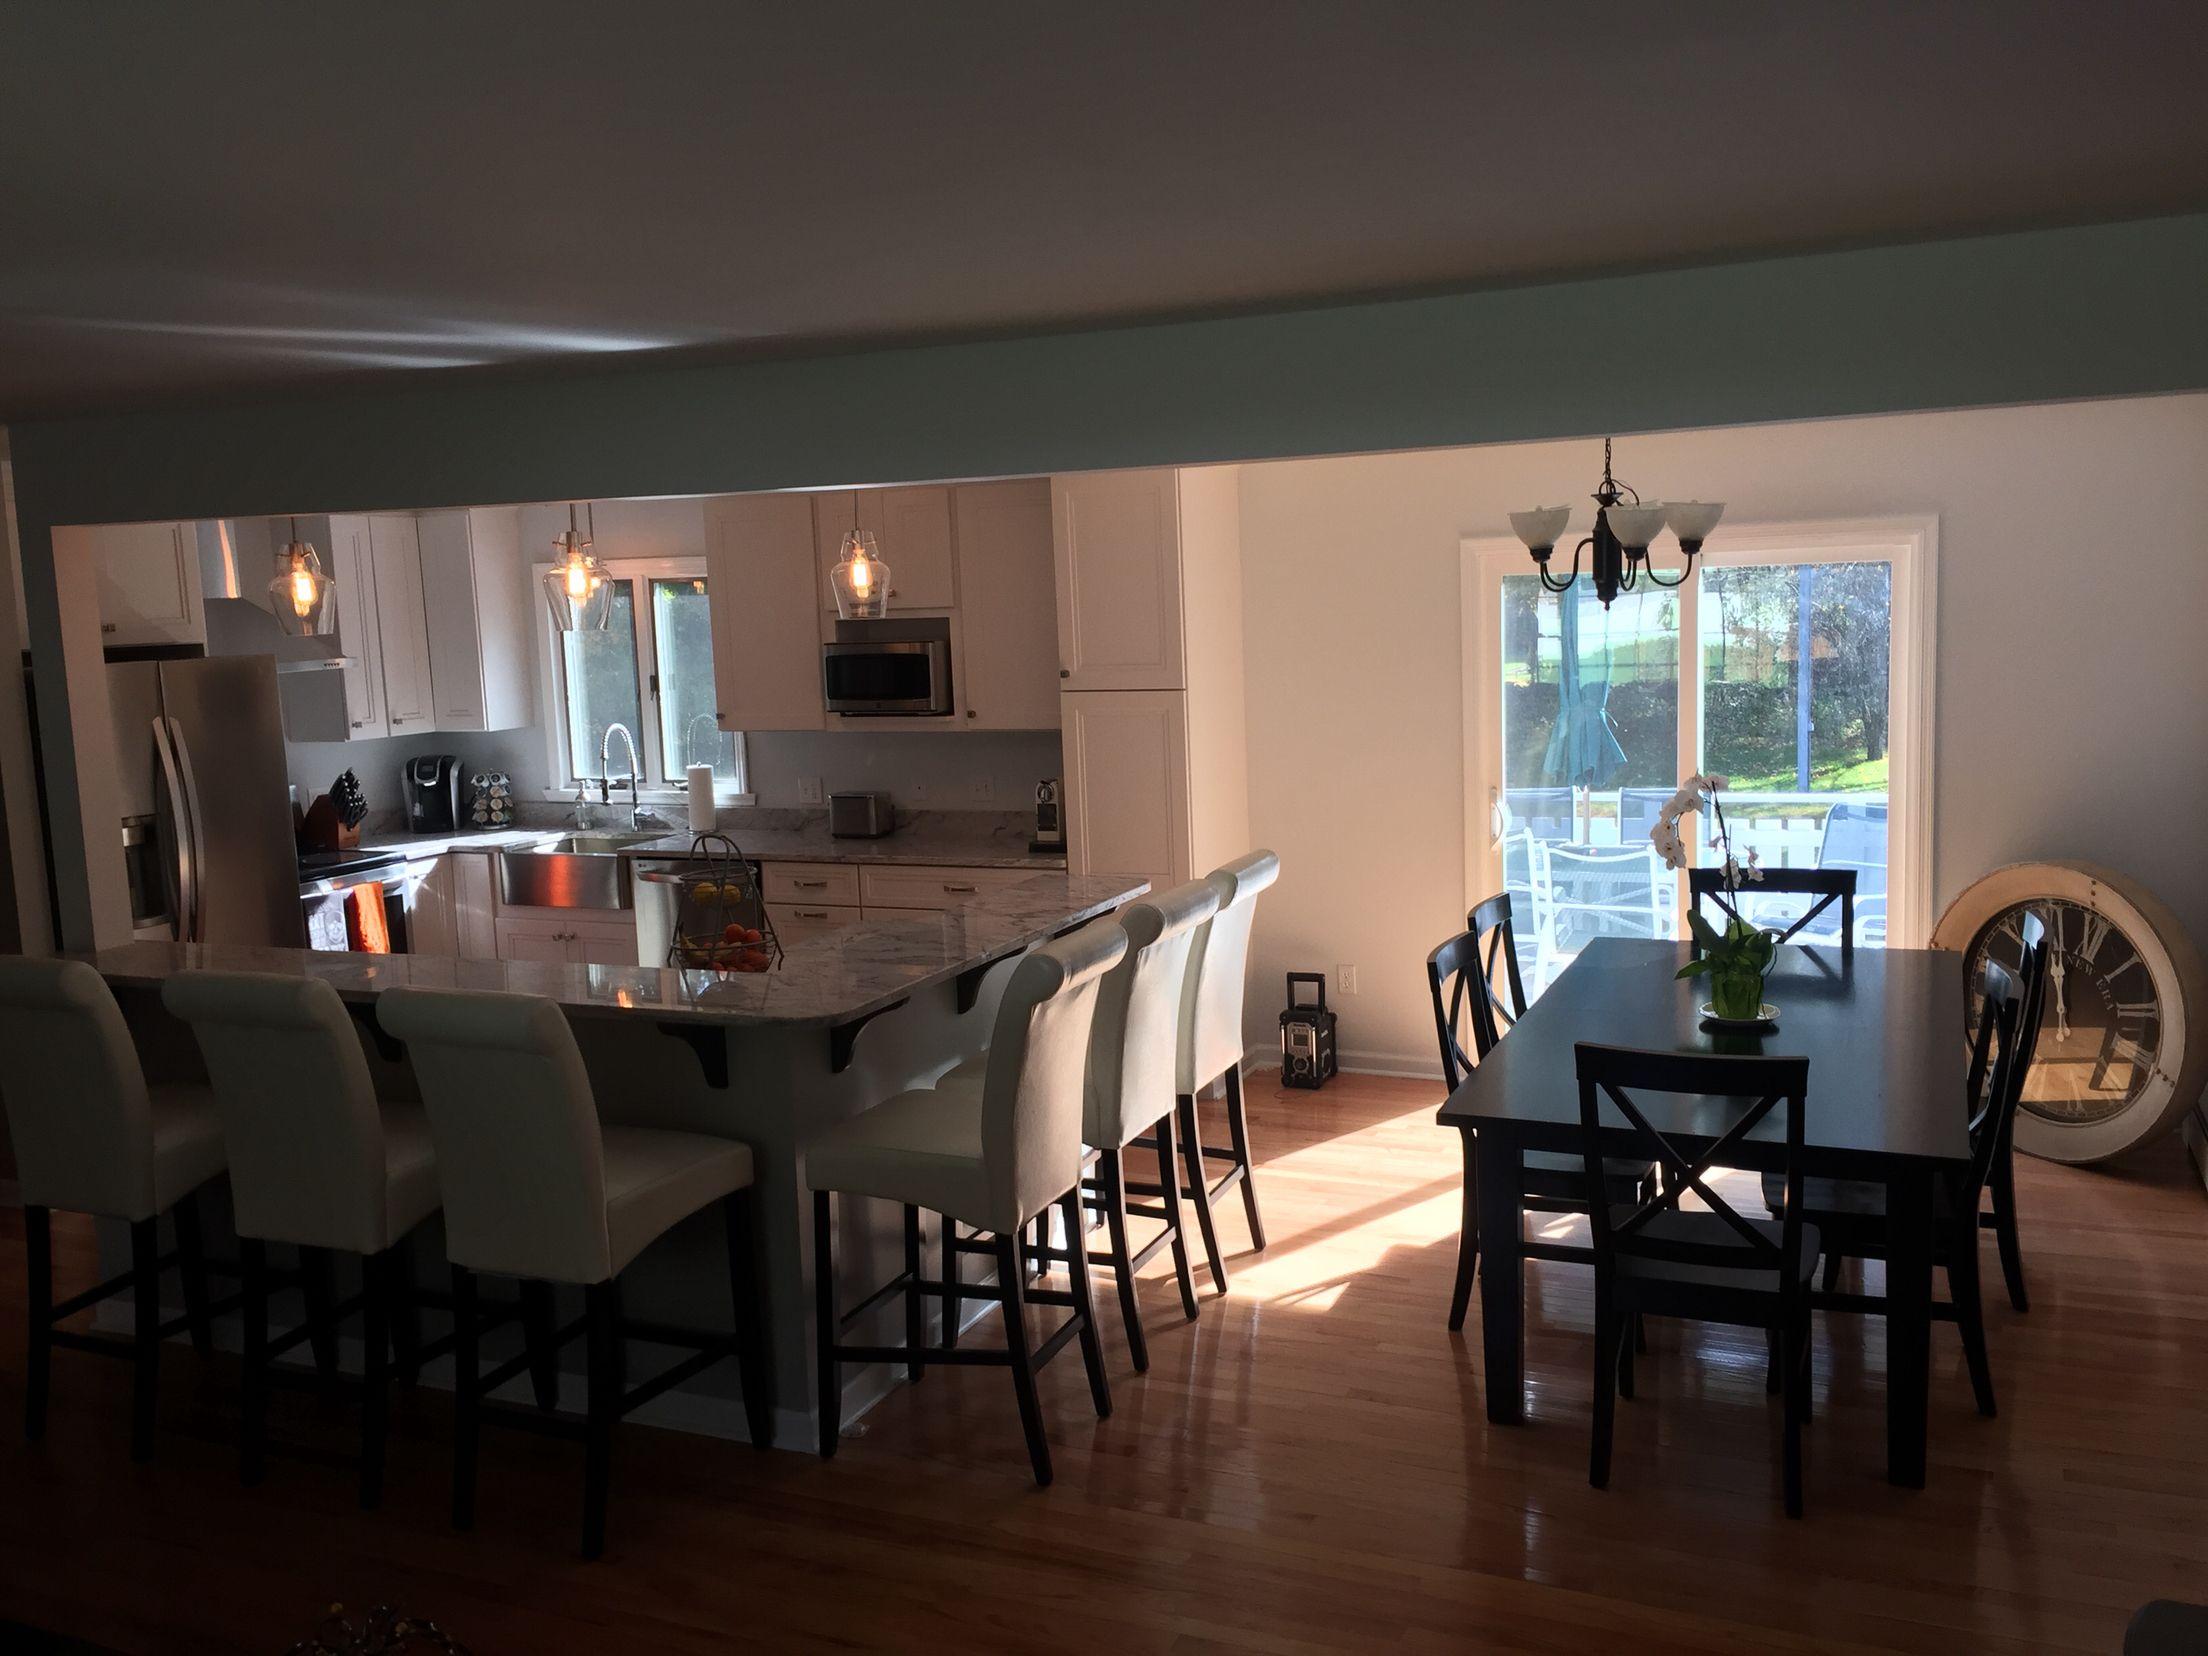 Decorative Kitchen Decor